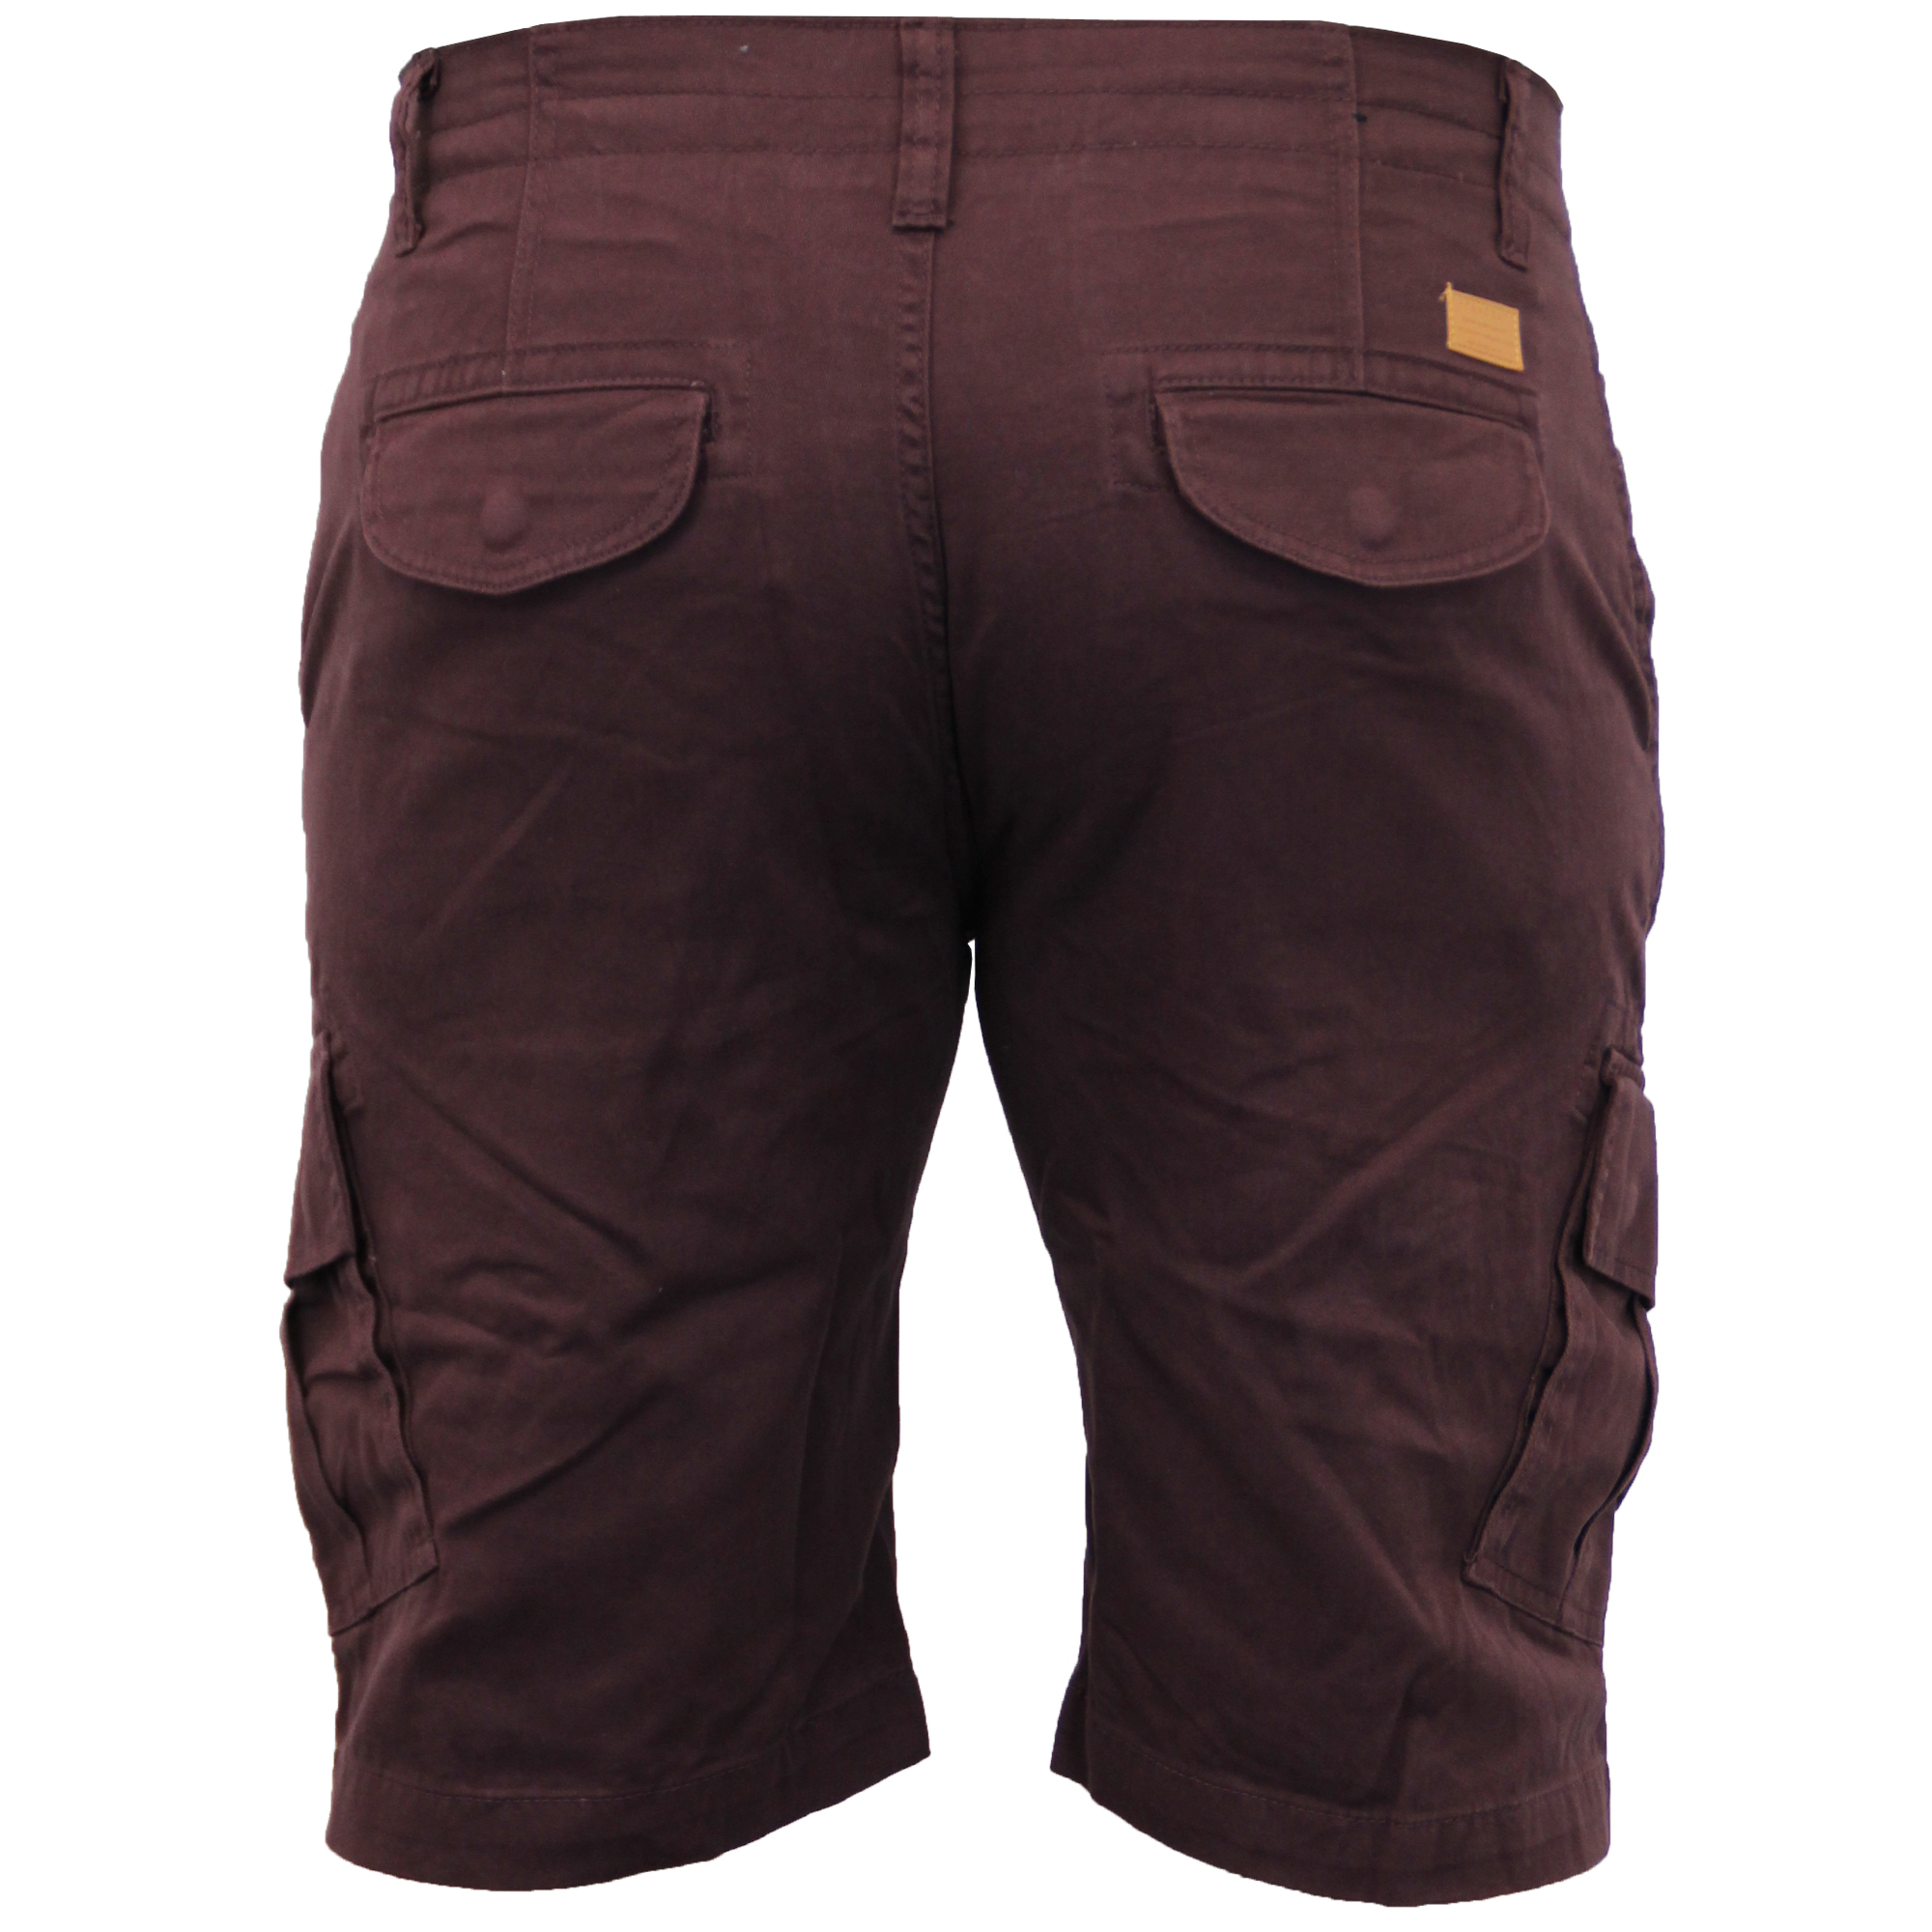 Mens-Cargo-Chino-Shorts-Threadbare-Combat-Knee-Length-Westace-Military-Summer thumbnail 8